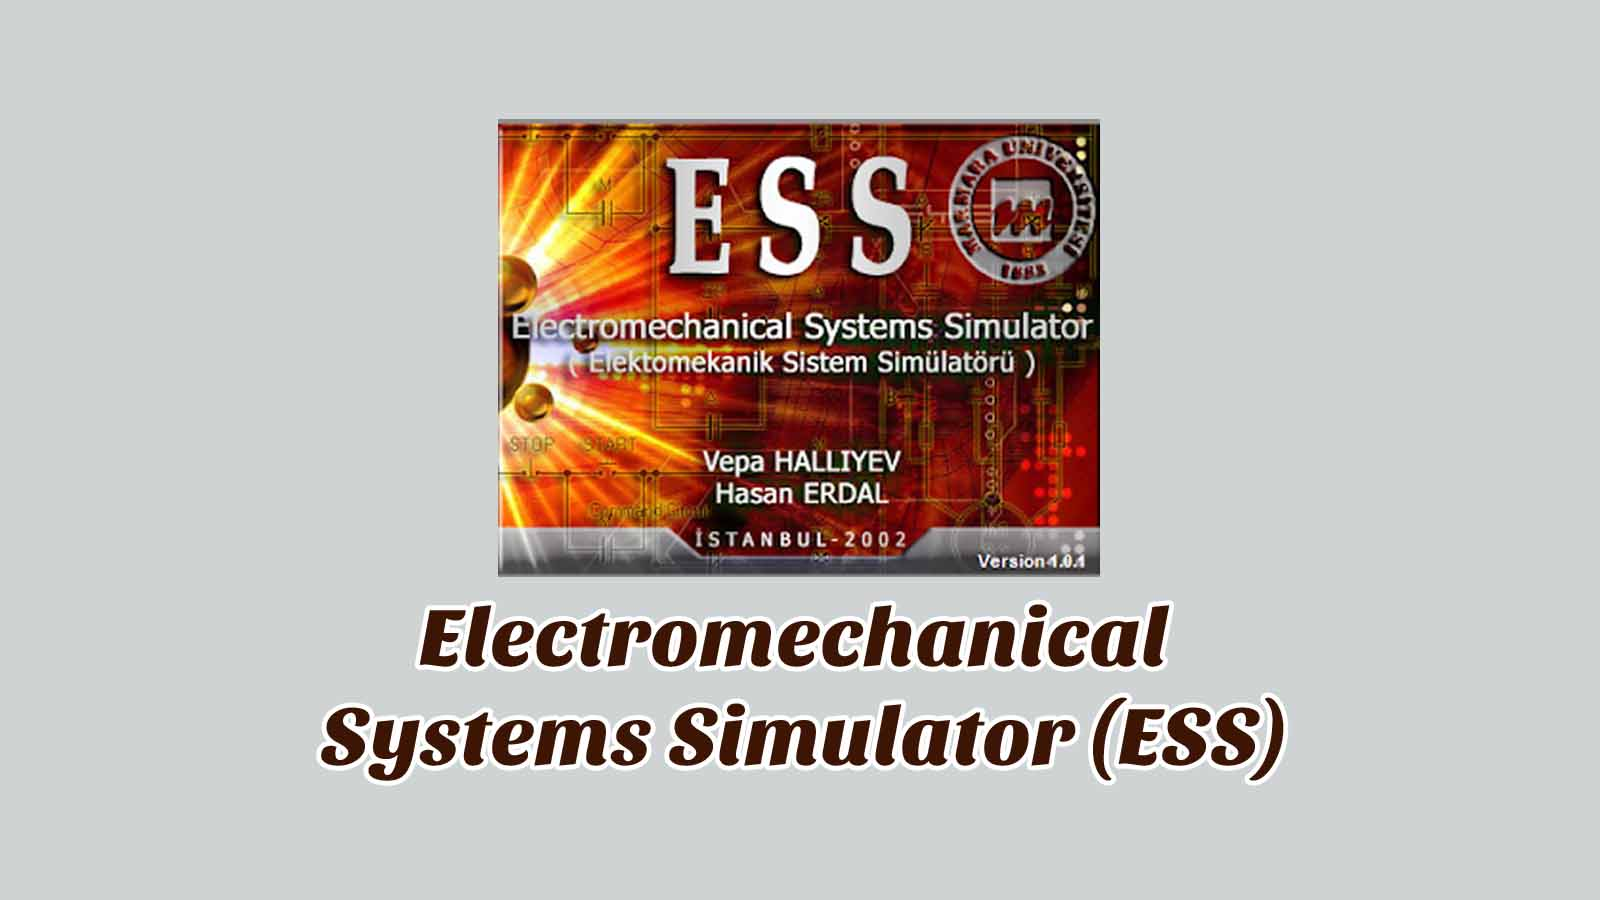 Daftar Isi Electromechanical Systems Simulator (ESS)